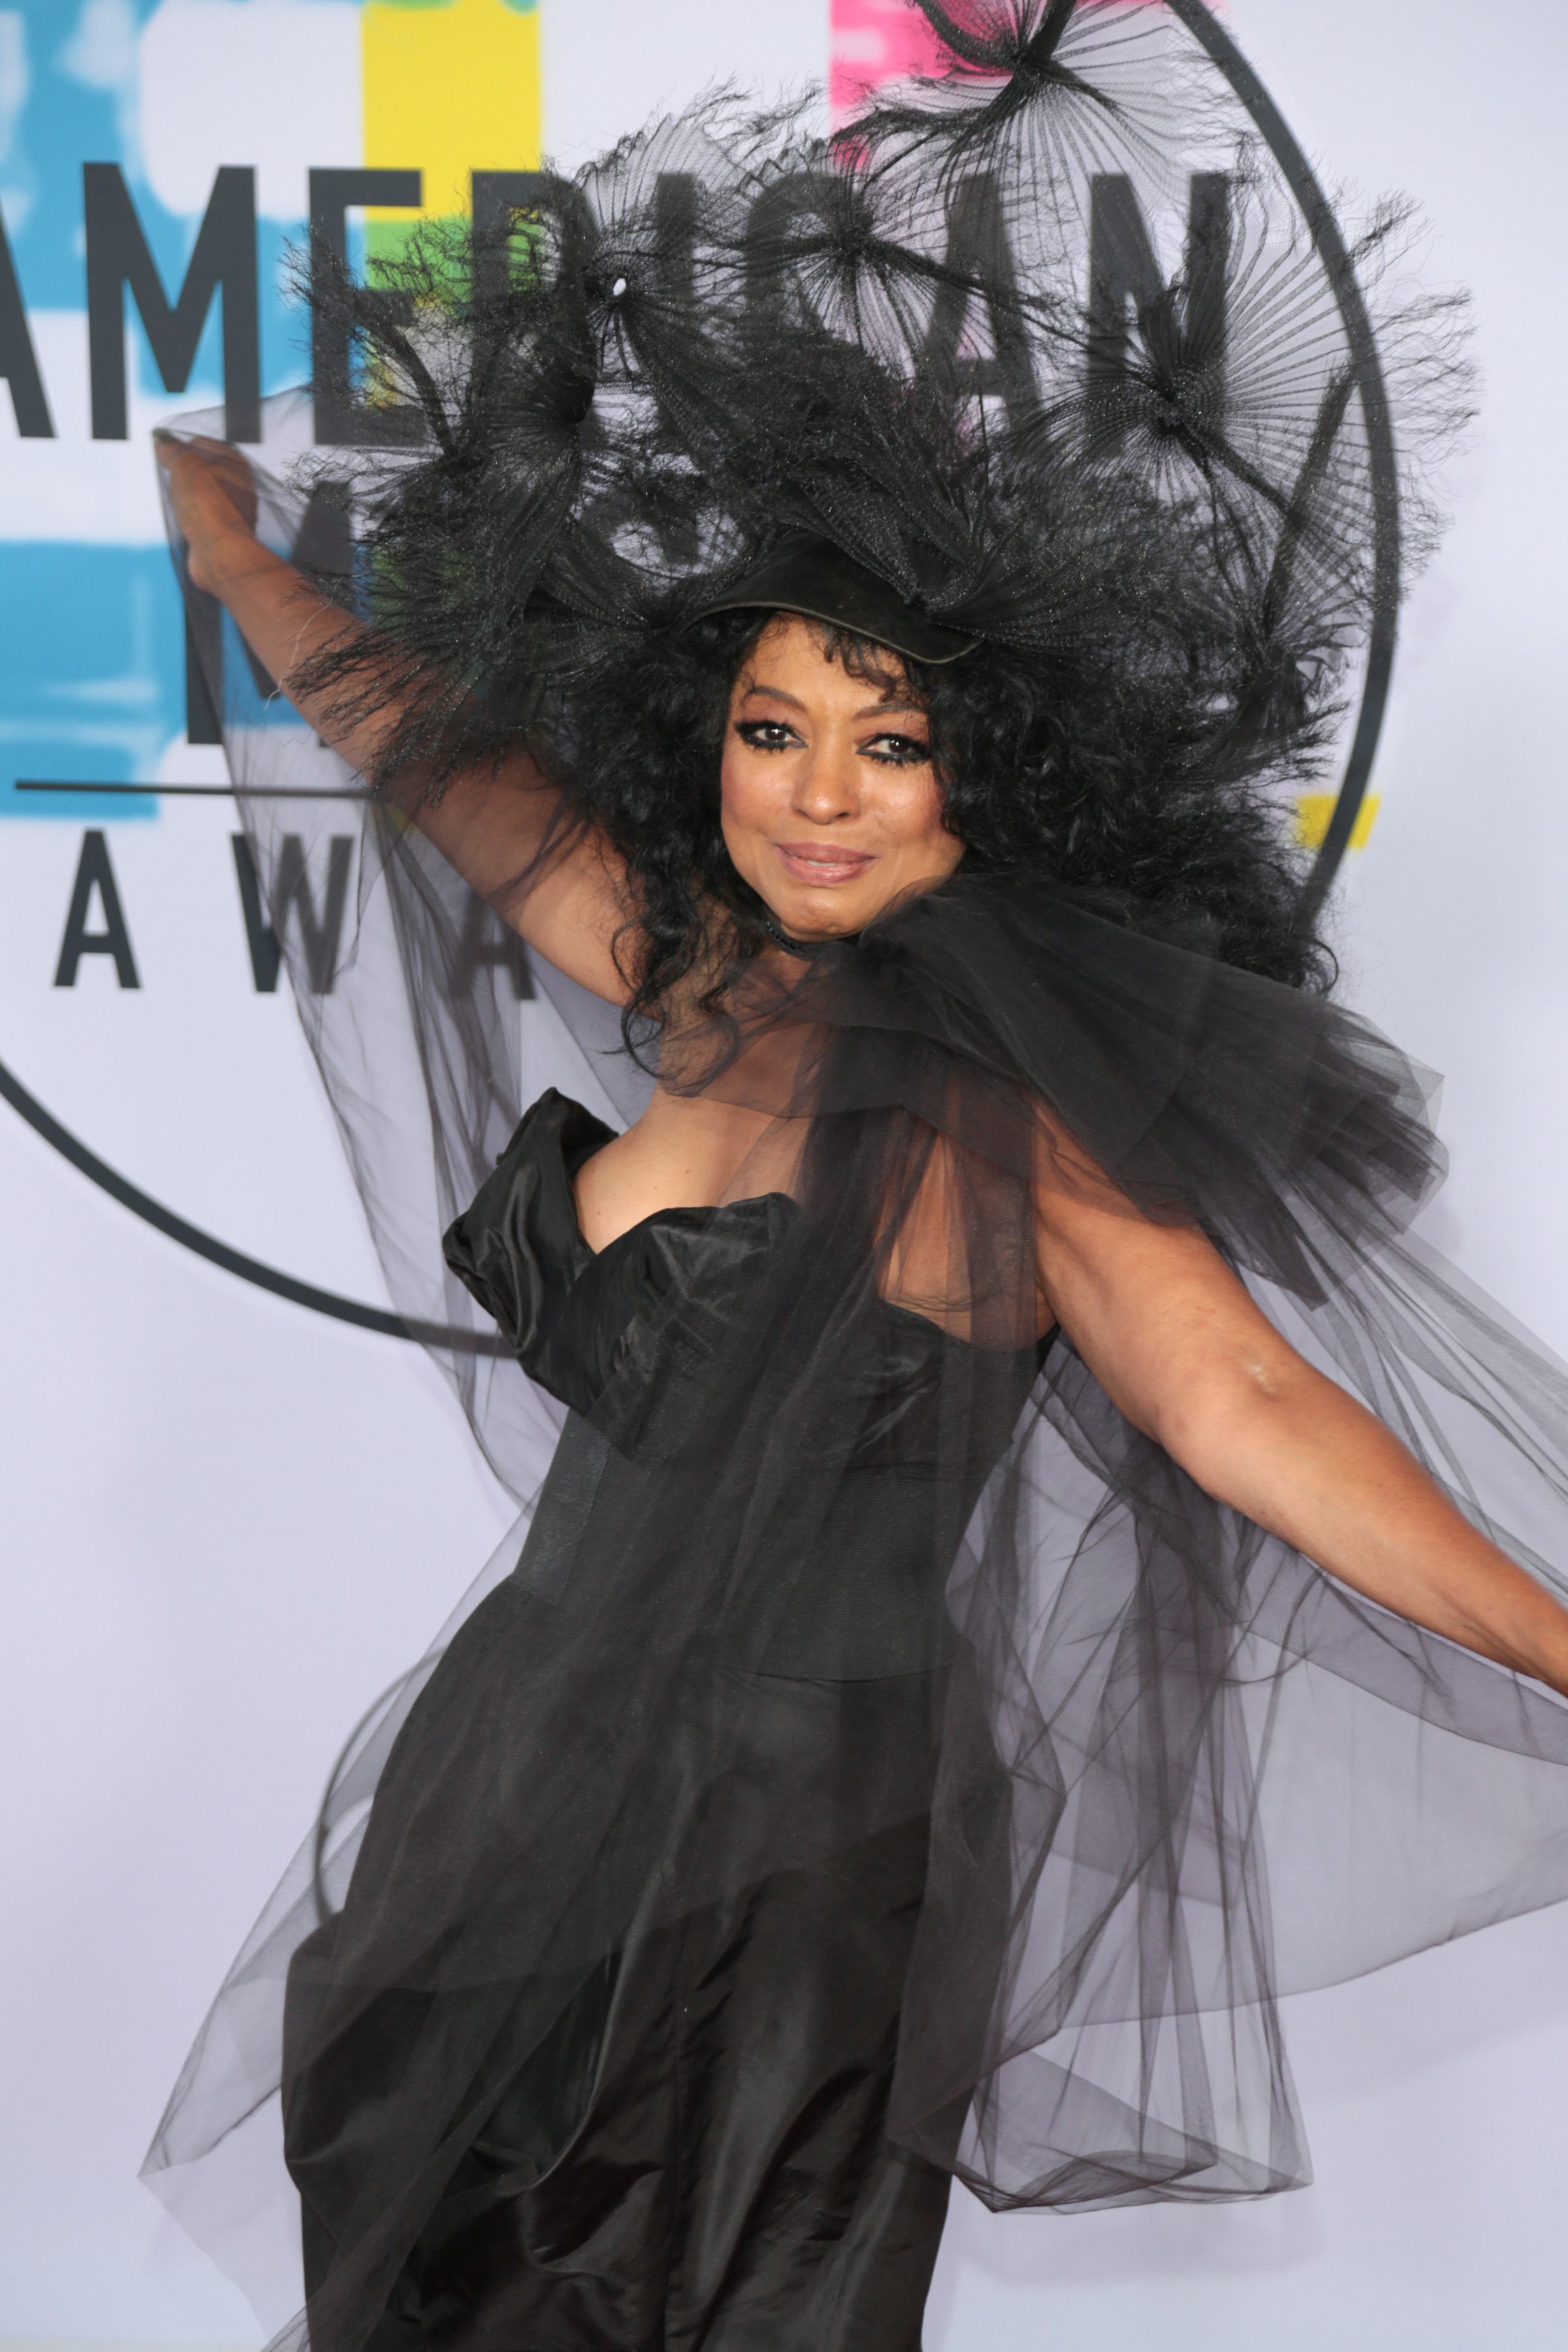 Diana Ross And Barbra Streisand Defend Michael Jackson